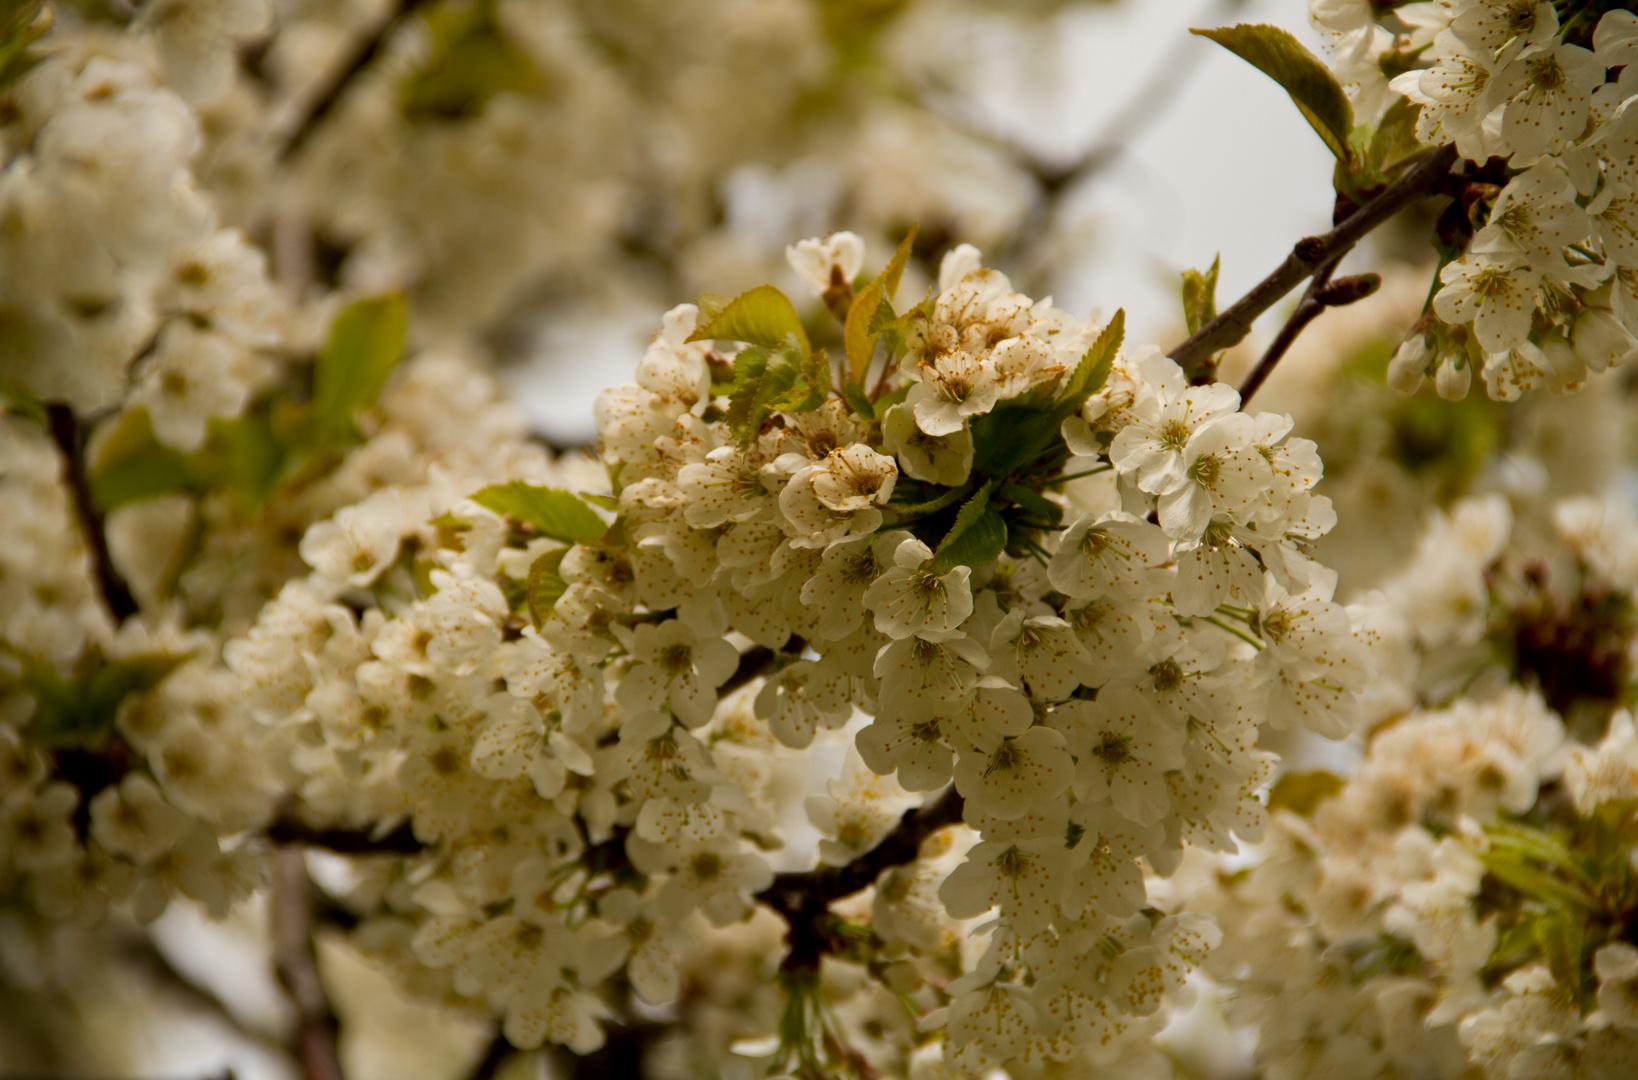 Blütenpracht am Erwachen